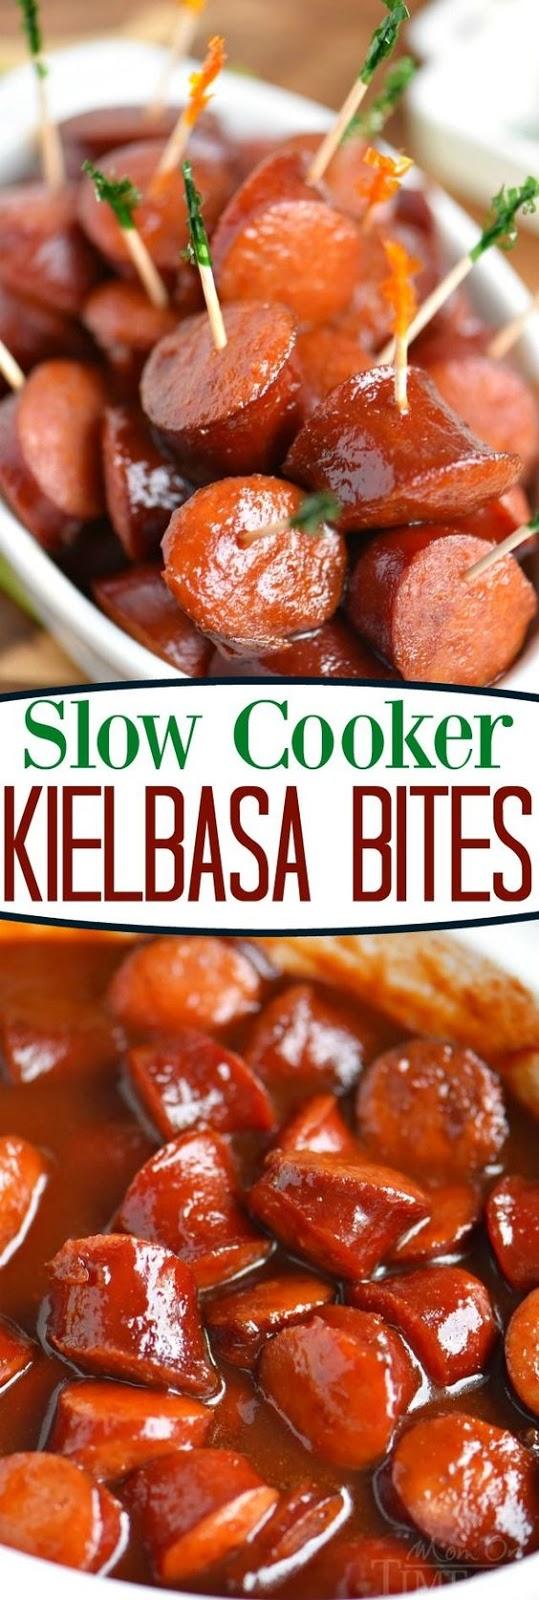 Slow Cooker Kielbasa Bites